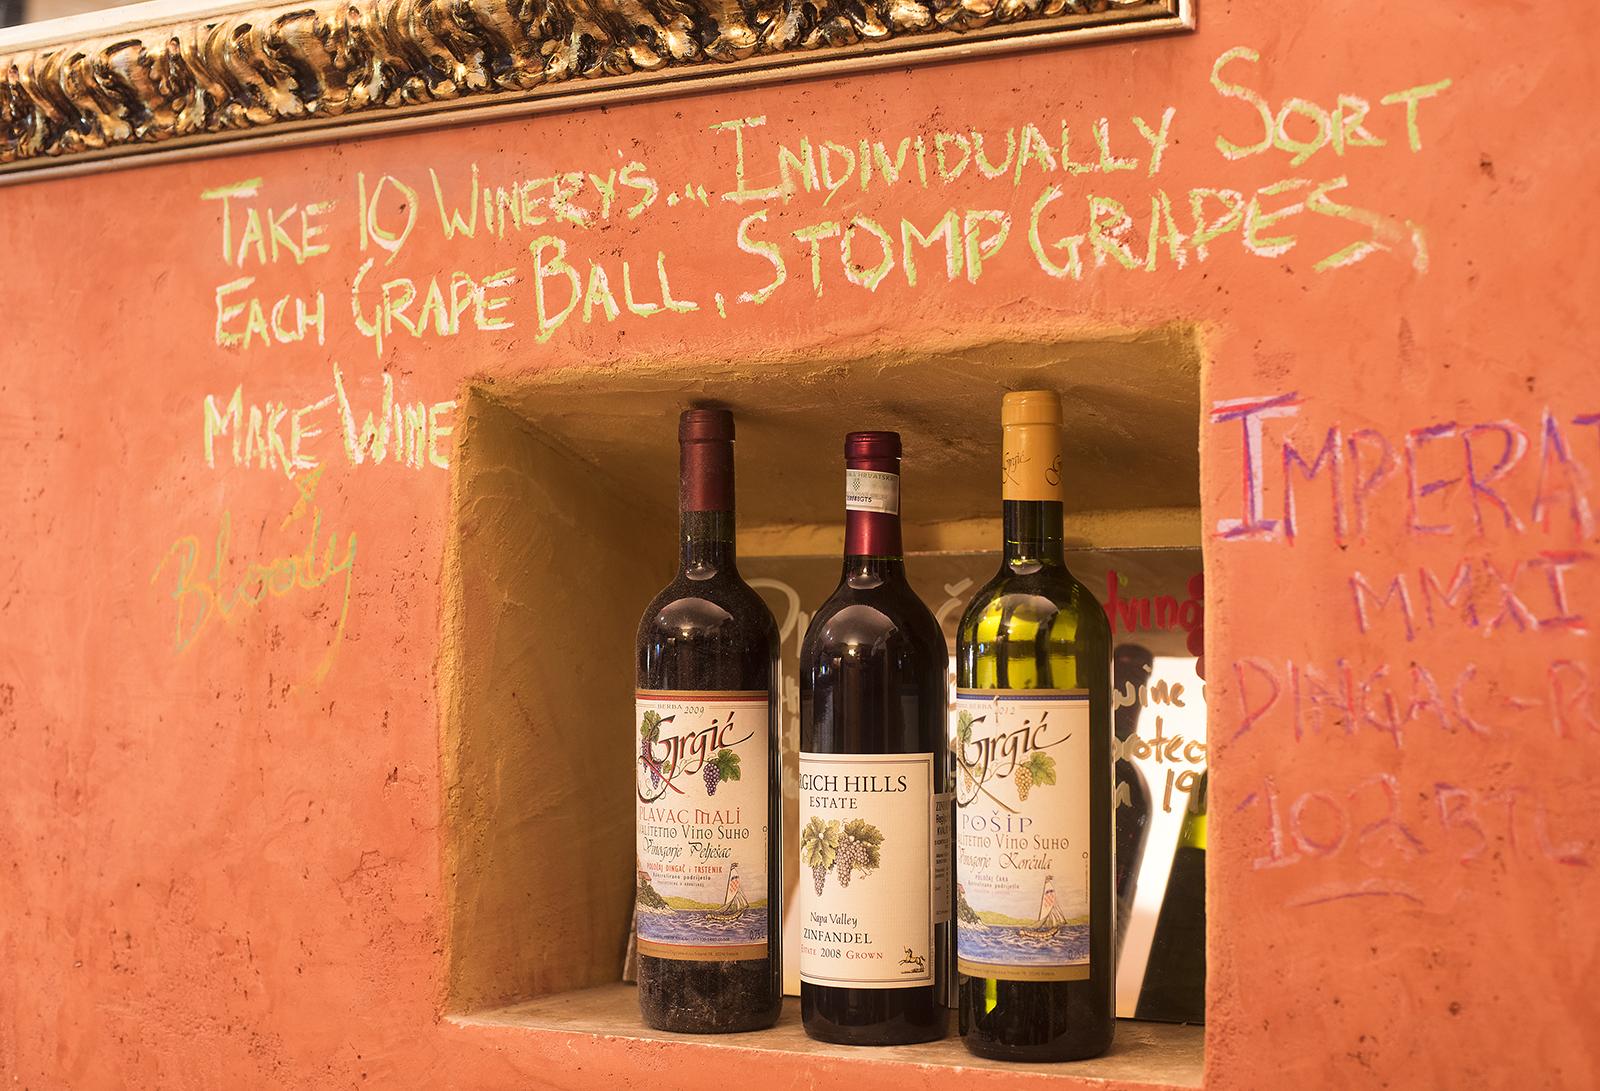 dvino godubrovnik croatia dubrovnik wine